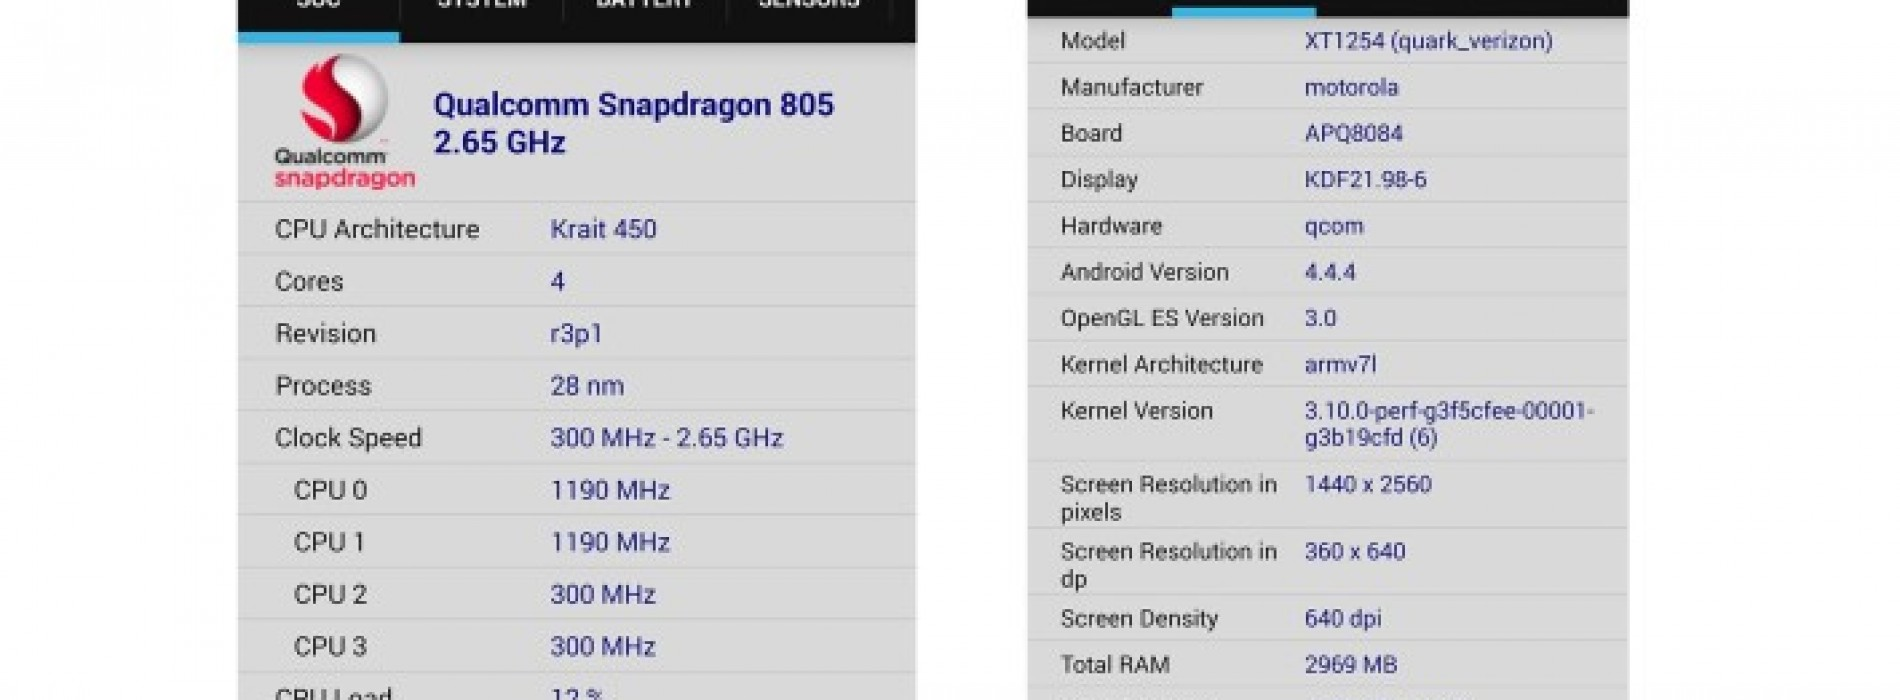 Specs leak for Verizon Droid Turbo